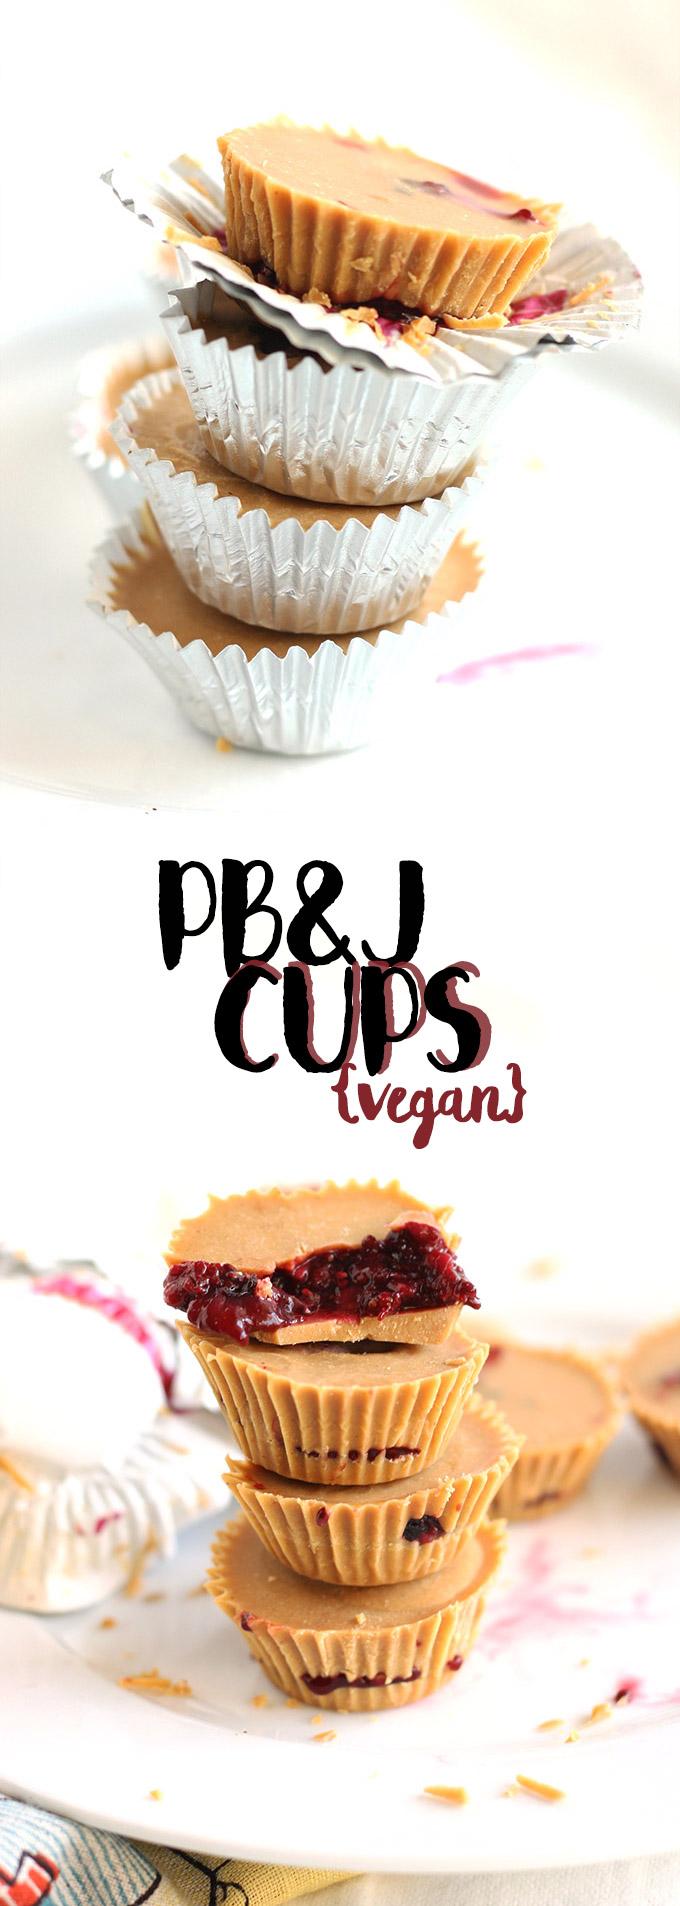 vegan pb&j cups (sugar free!) | love me, feed me